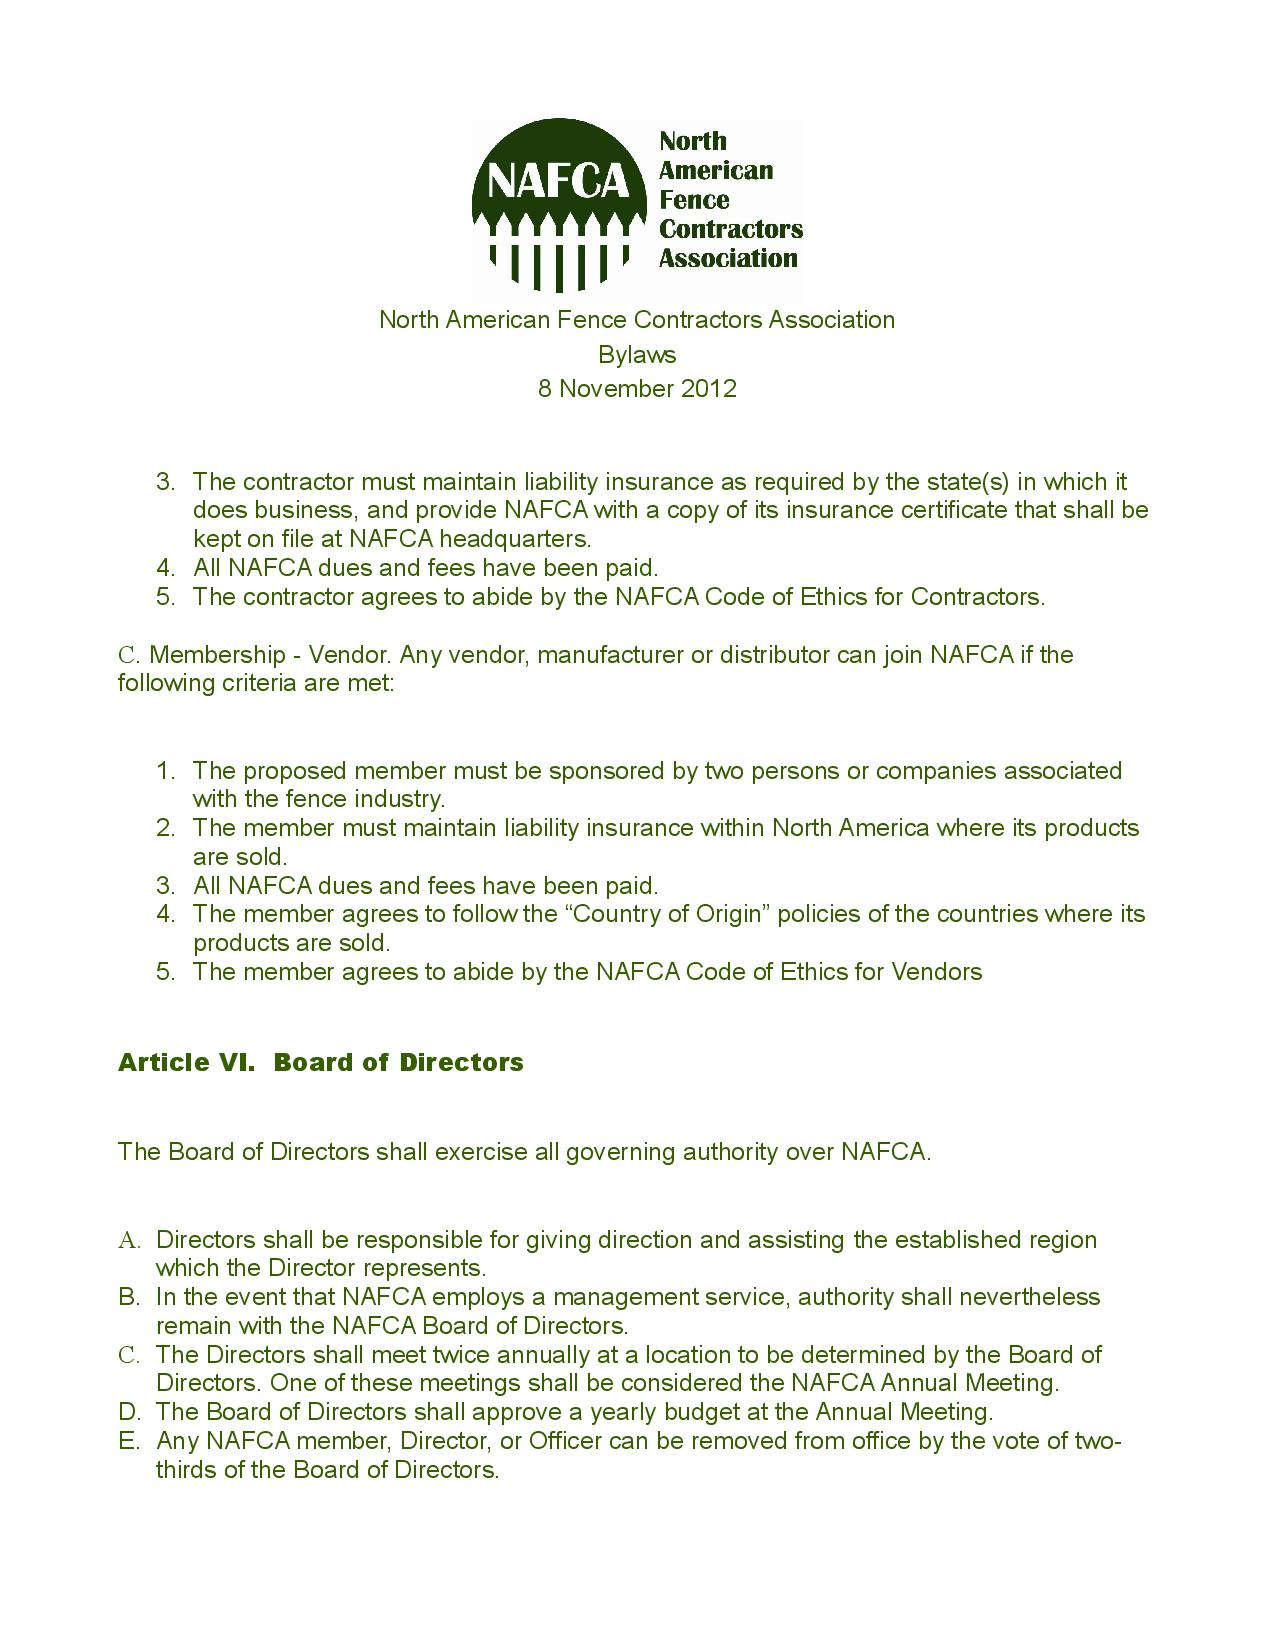 NAFCA Bylaws 8 11 2012-page-002